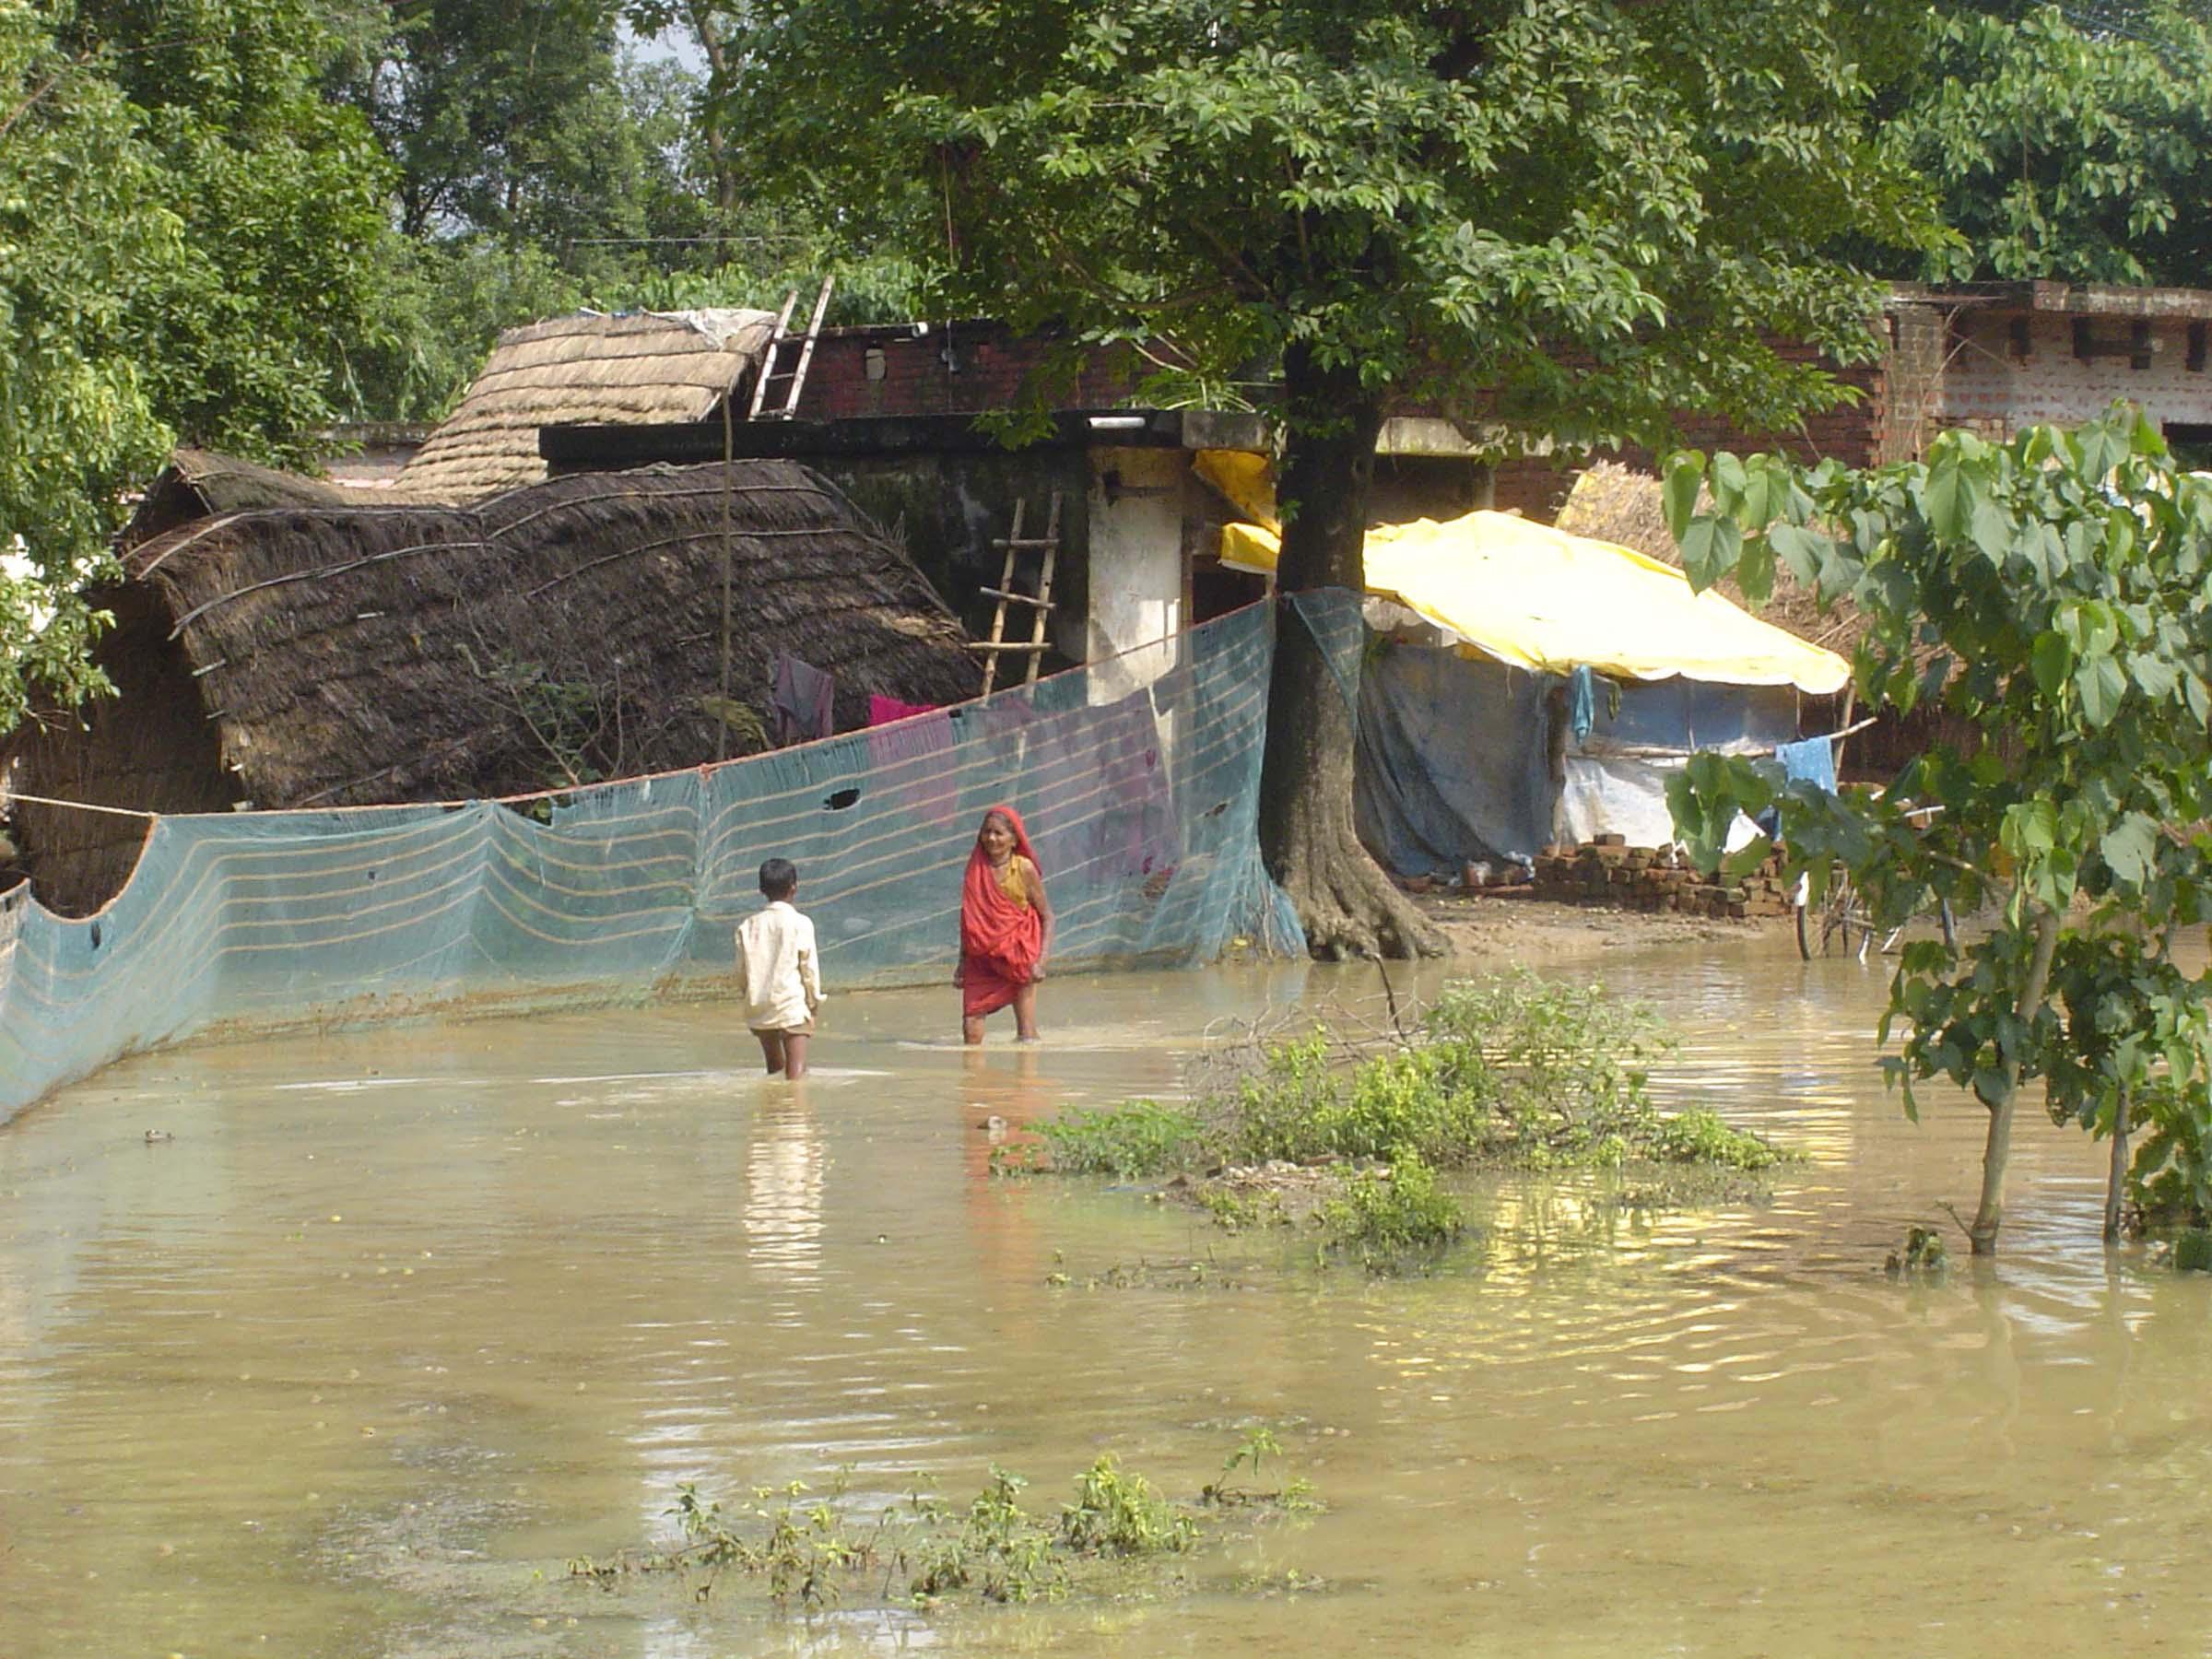 Recurring floods